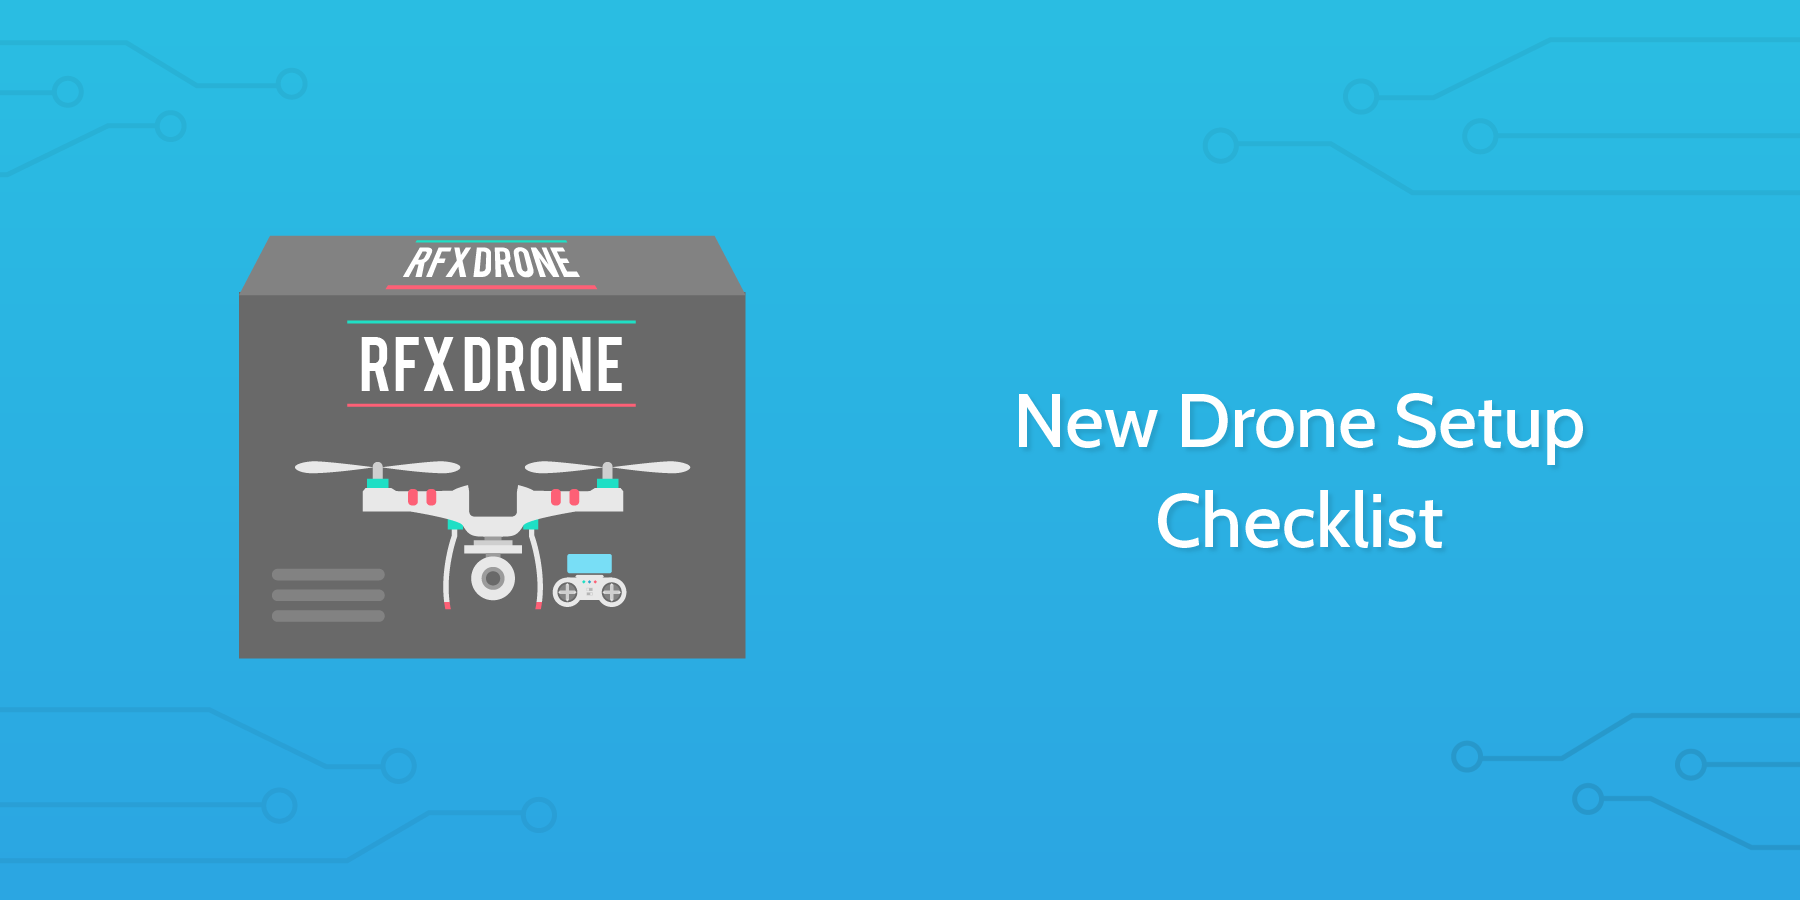 New Drone Setup Checklist